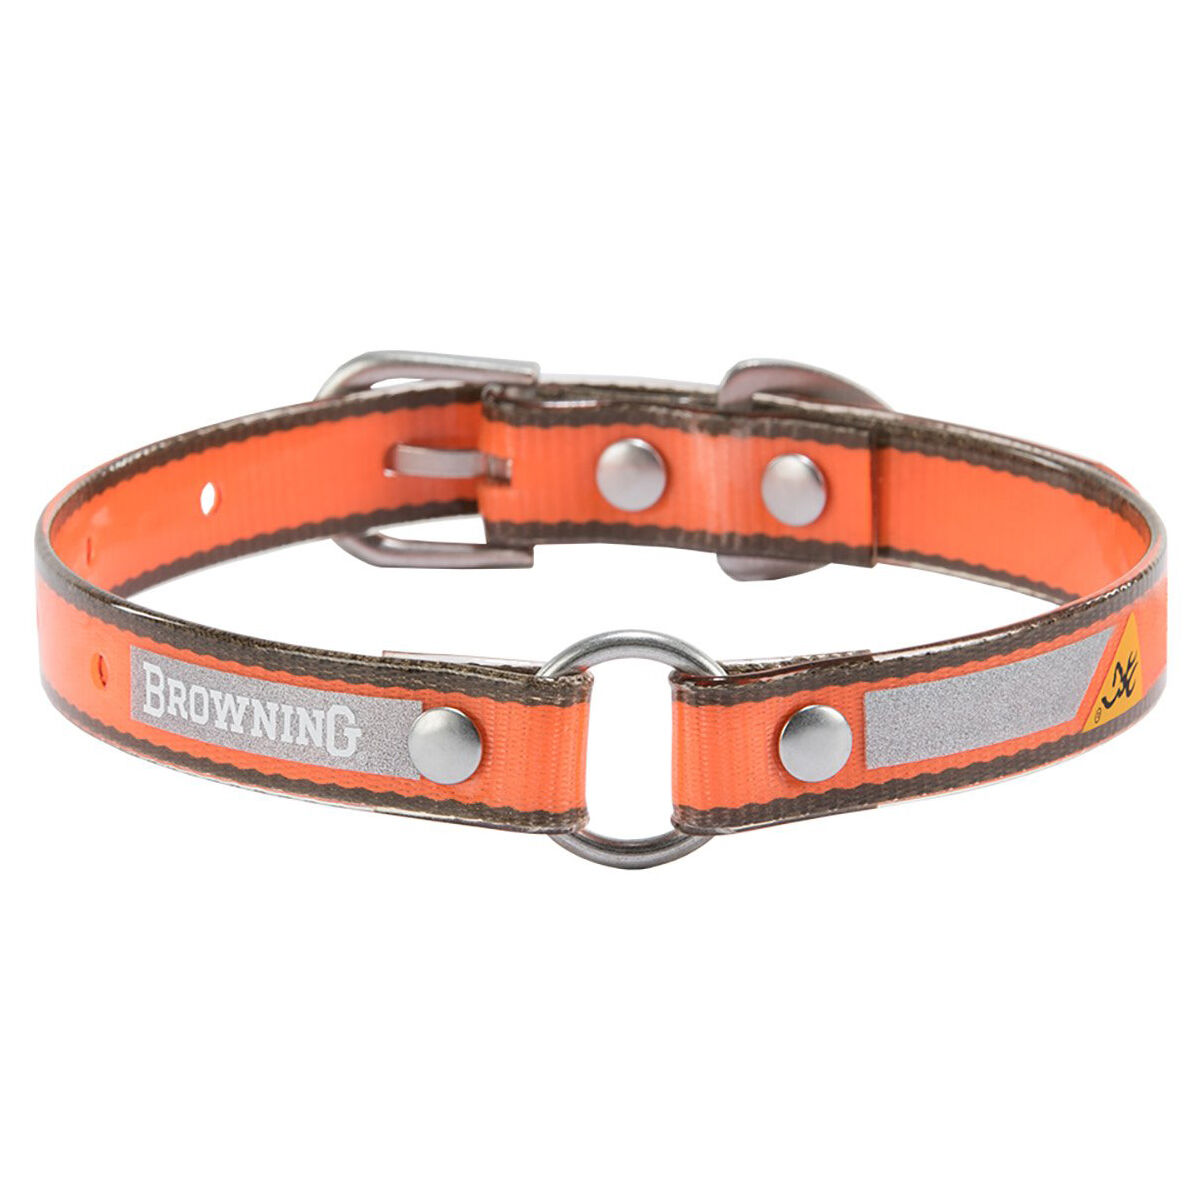 Survival Cord Browning Survival Cord Dog Collar Tactical Dog Collar Large Teak